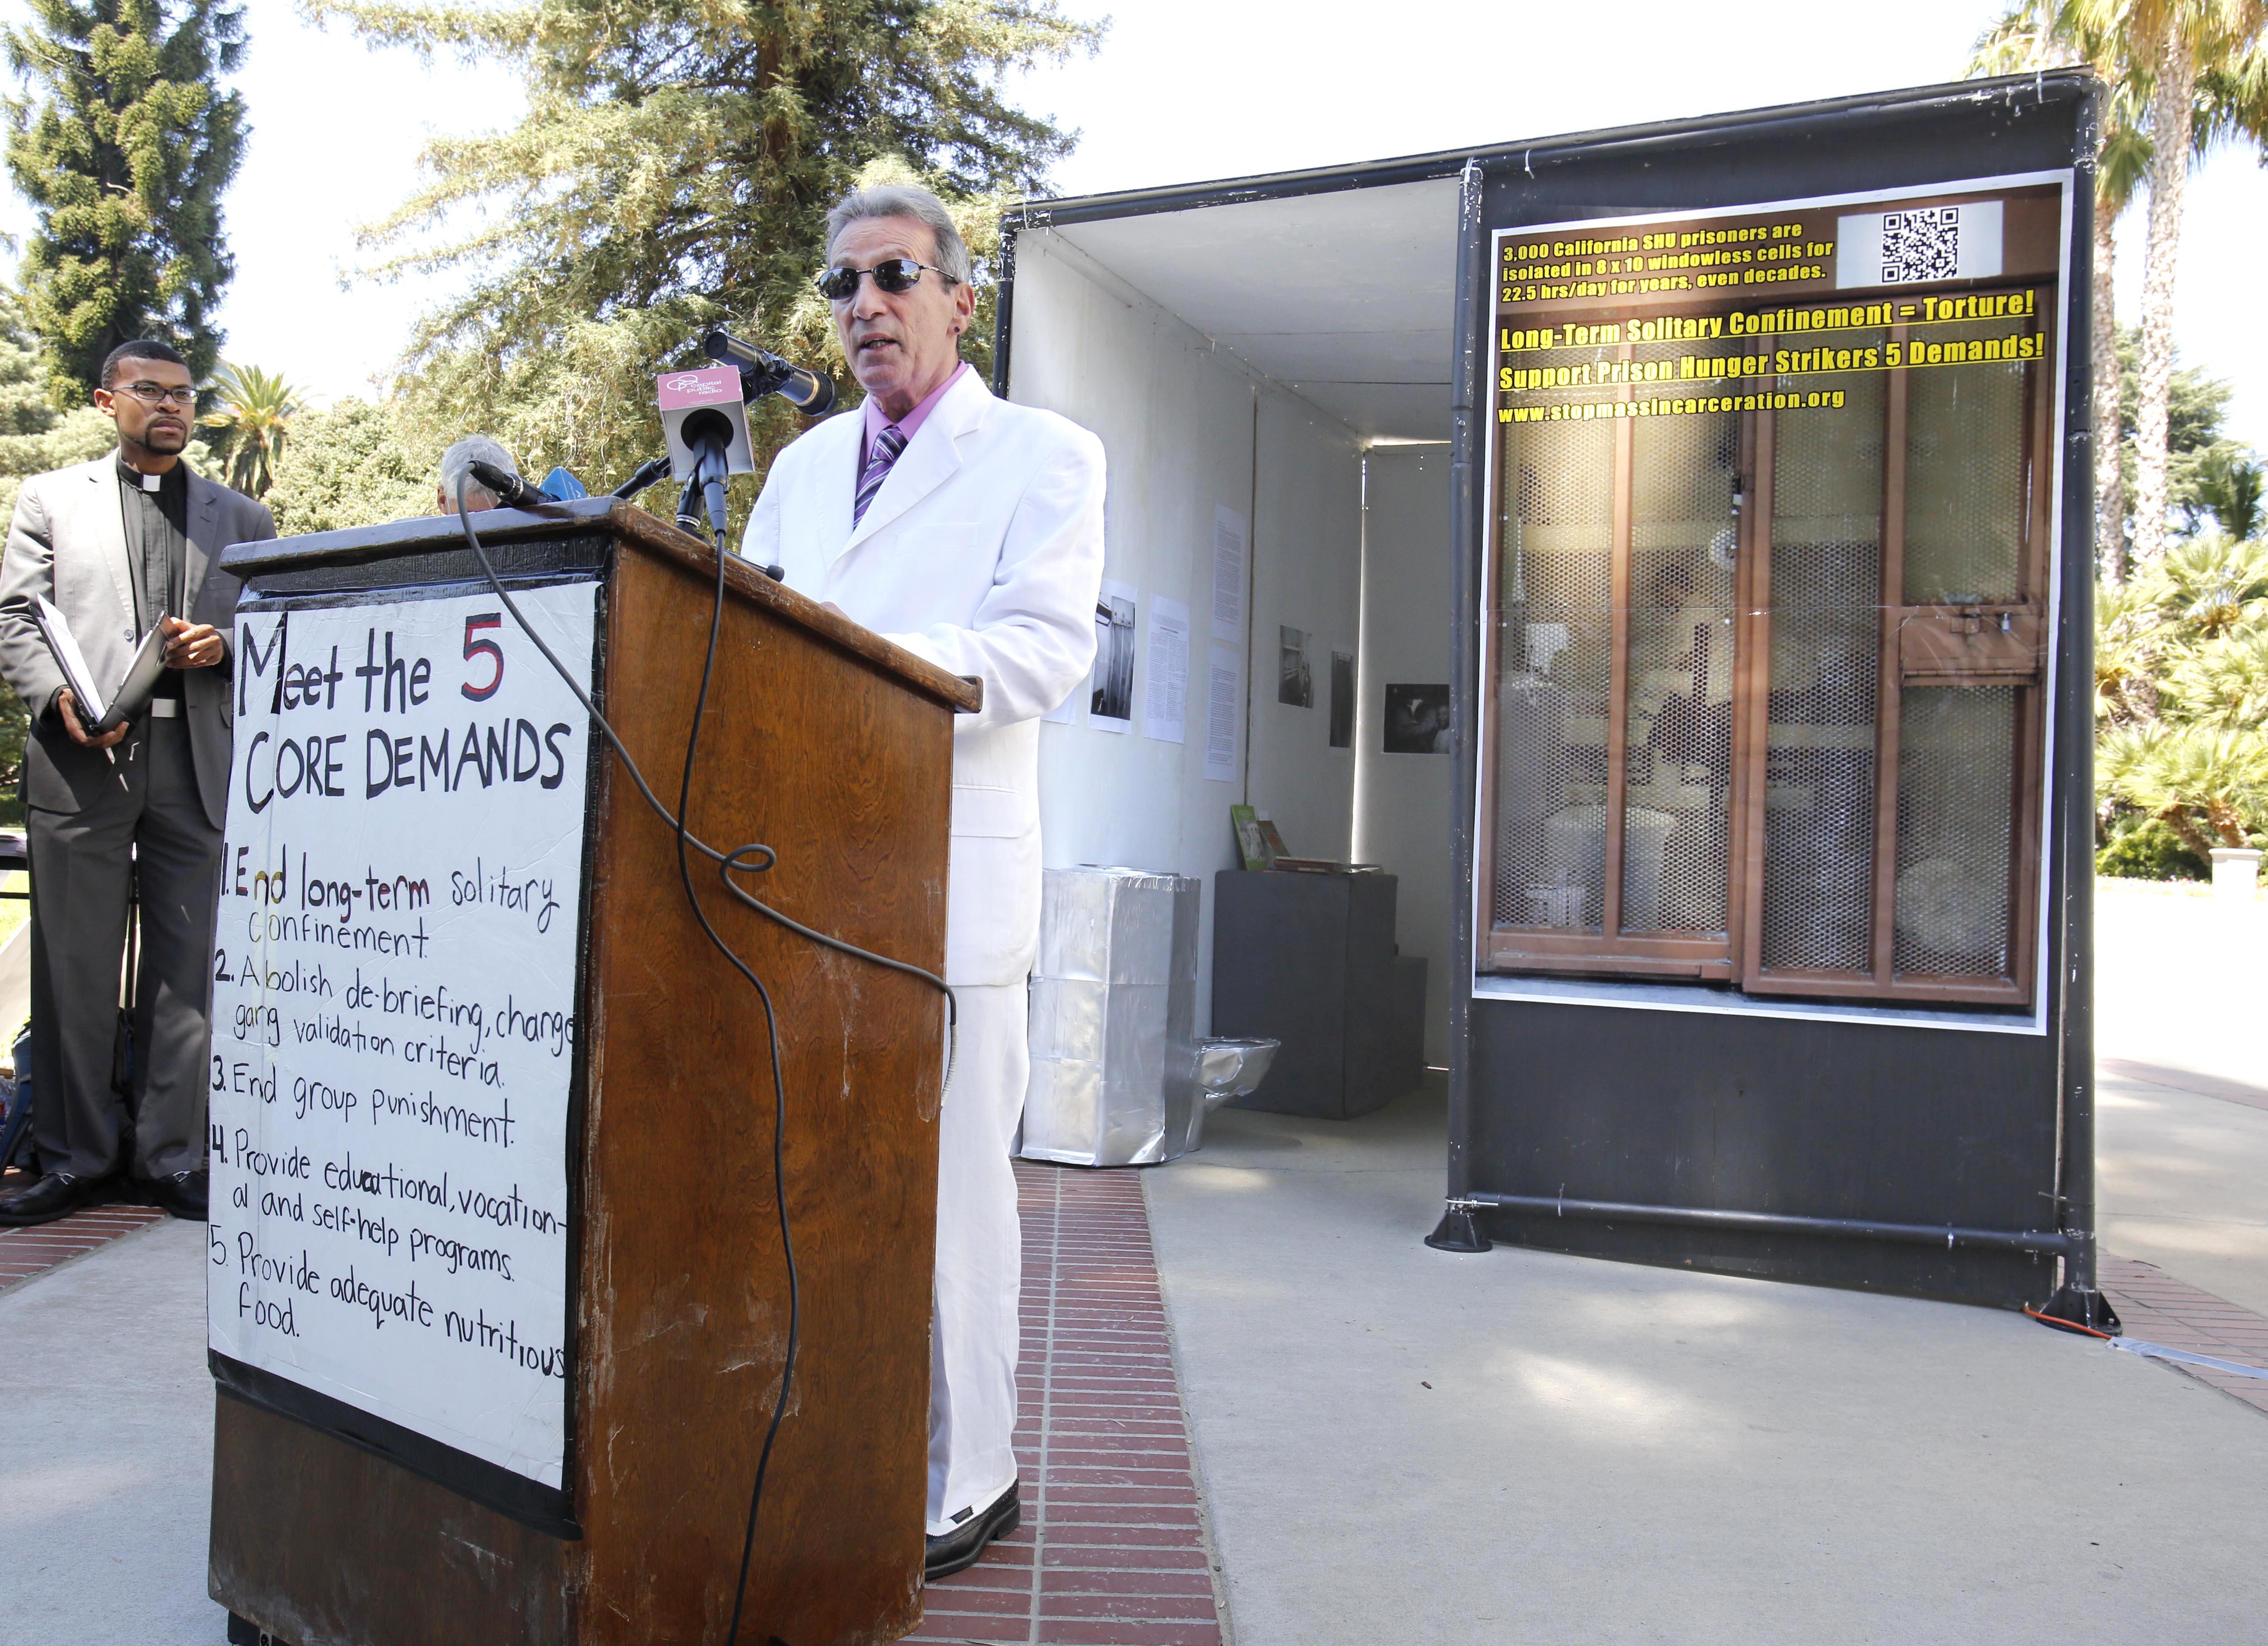 Judge OKs force-feeding California inmates - CBS News